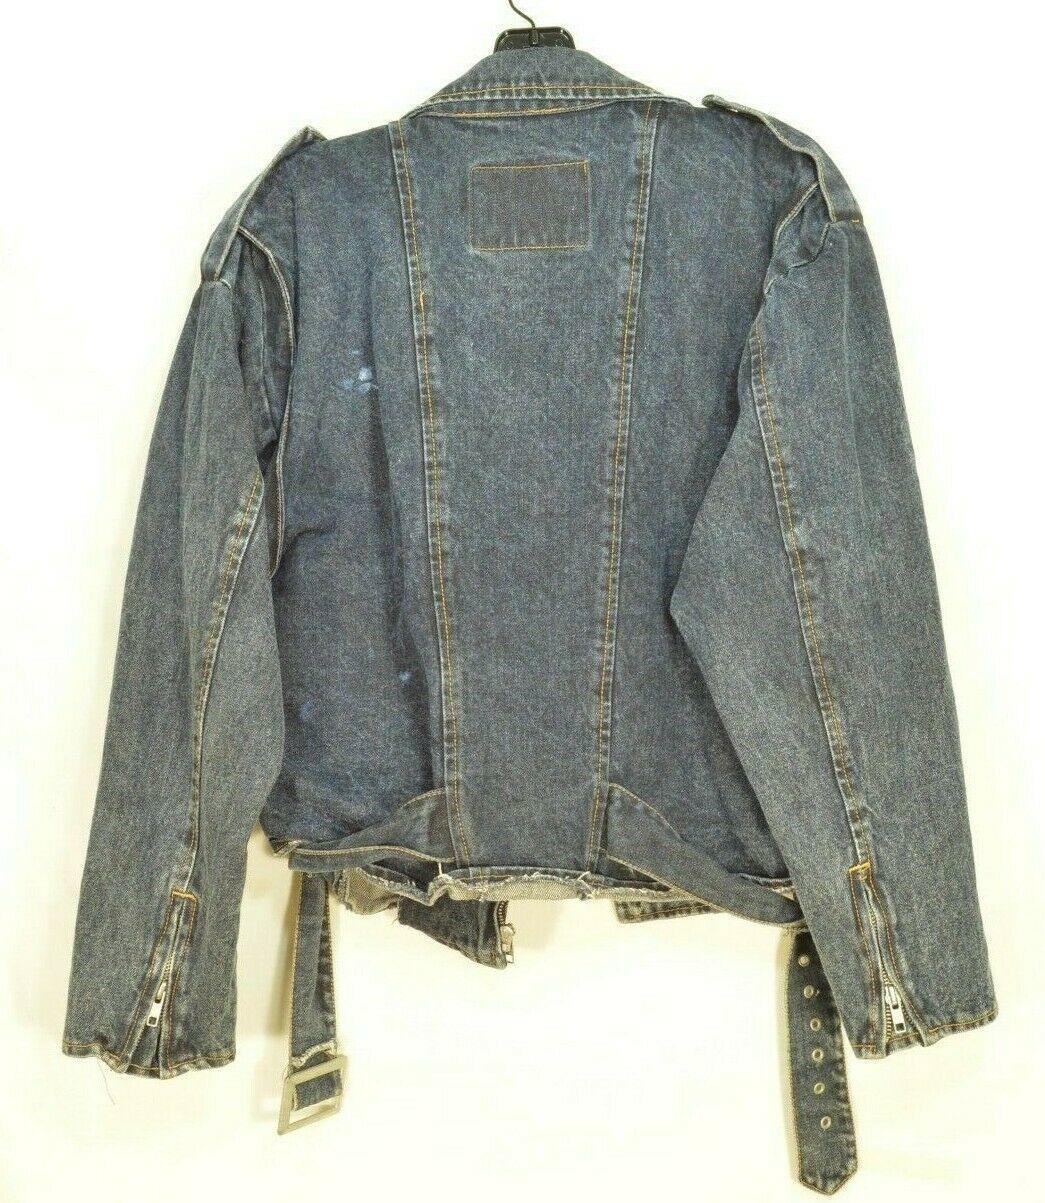 Jordache jeans jacket SZ M denim moto style vintage zippers pockets belt dark image 8